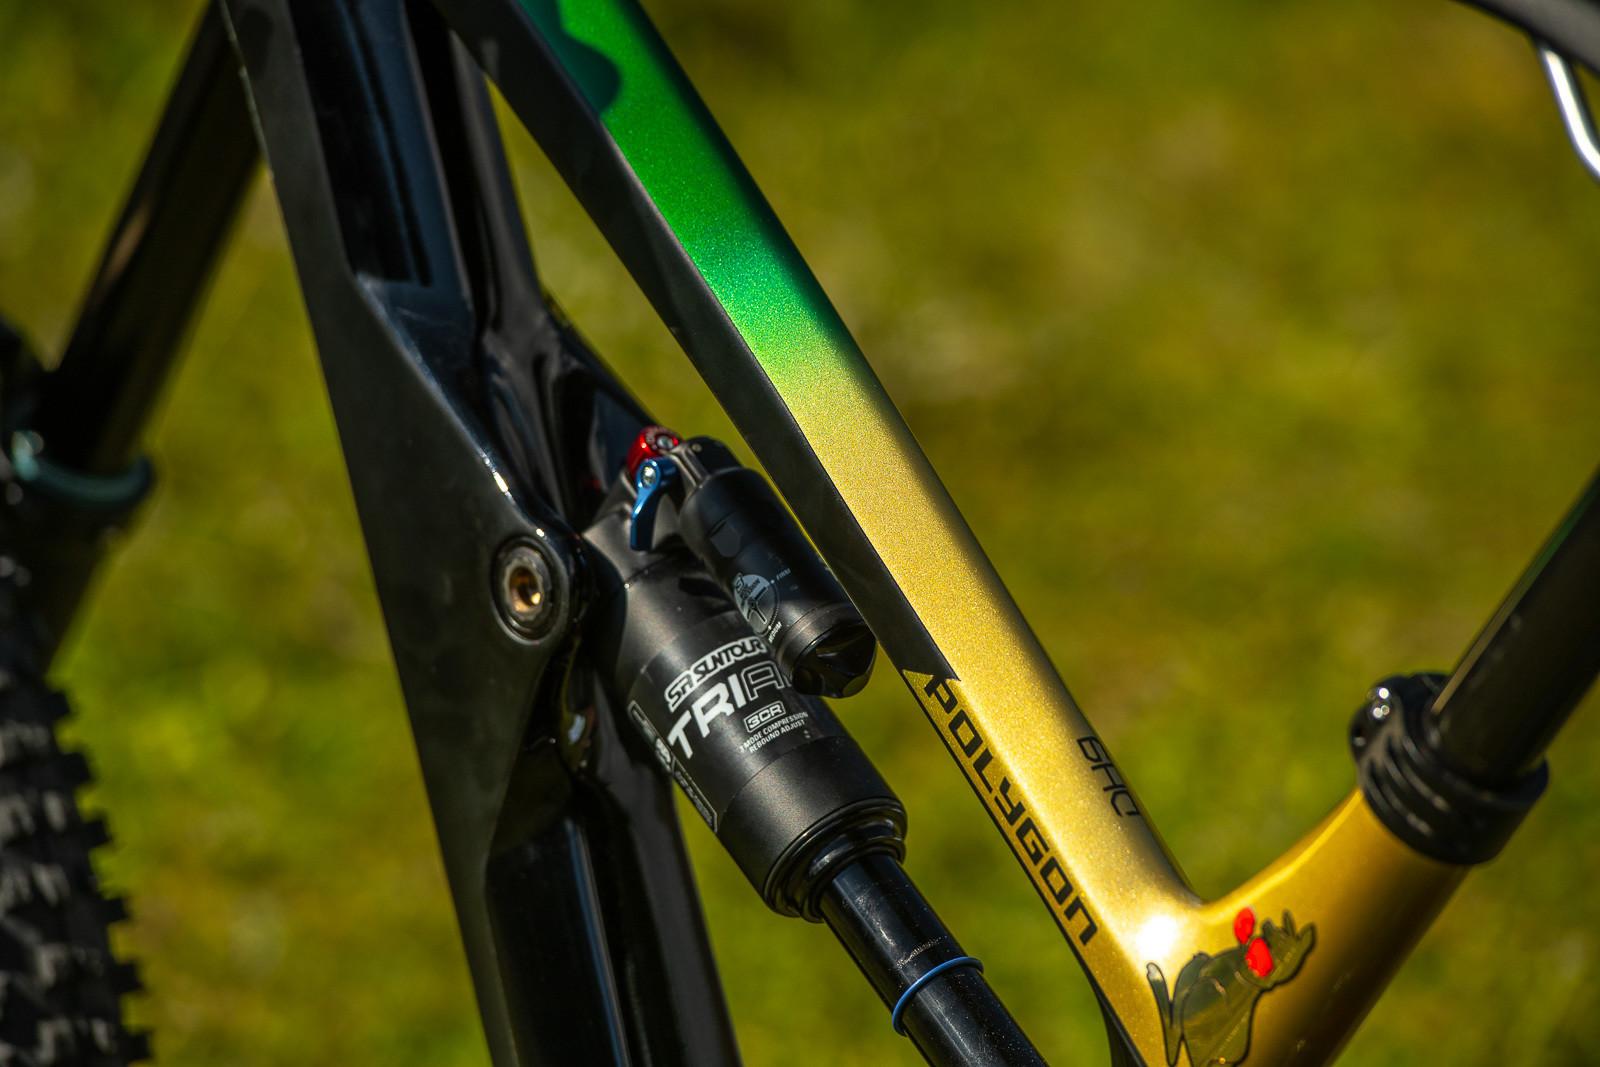 SR Suntour TriAir Shock - WORLD CHAMPS BIKES - Mick & Tracey Hannah's Polygons - Mountain Biking Pictures - Vital MTB